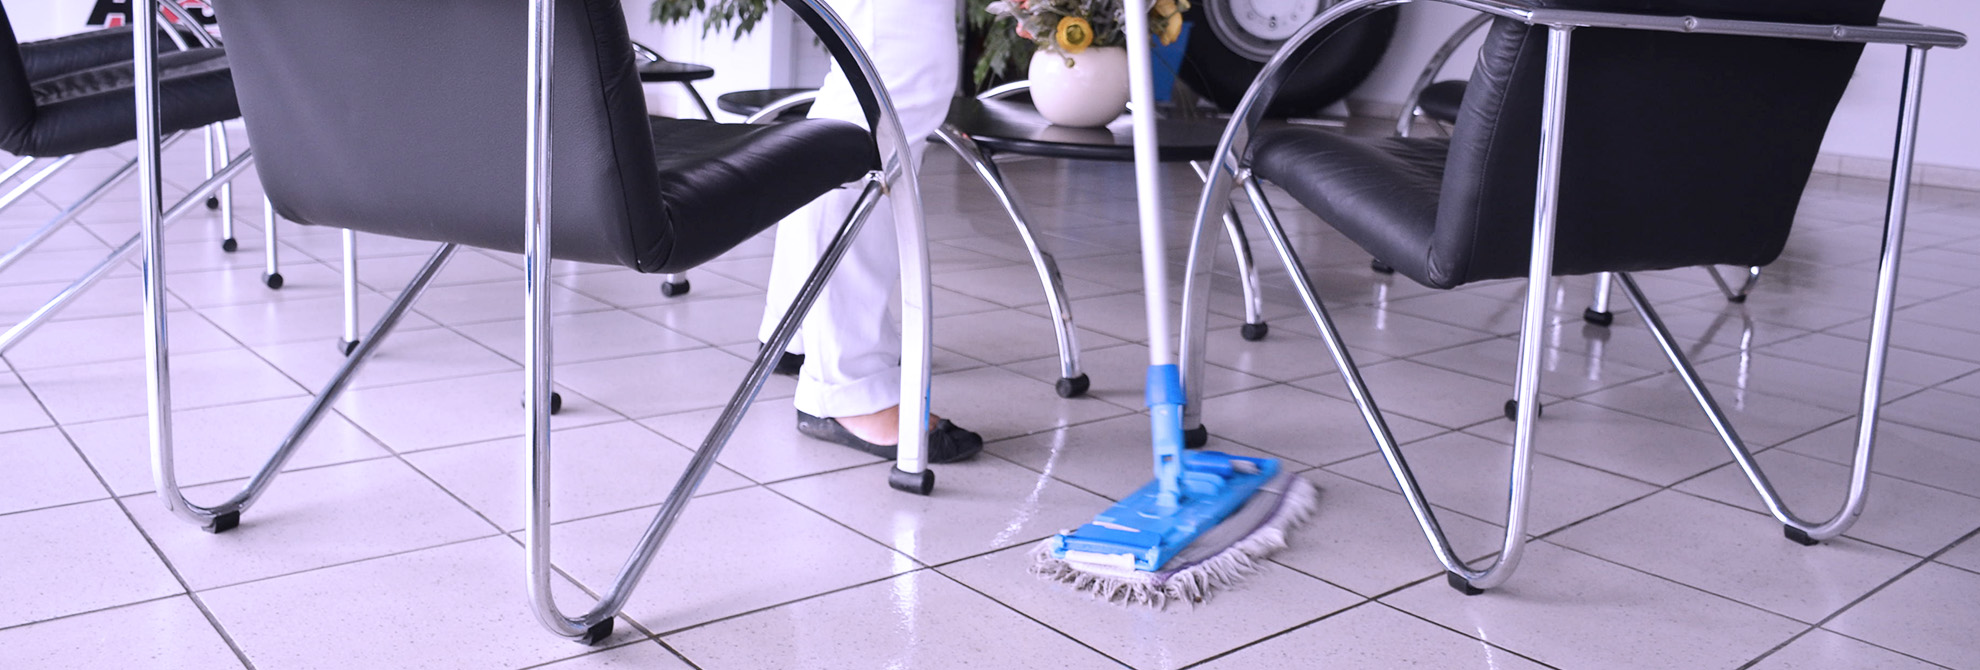 Service nettoyage professionnel normes hygiene